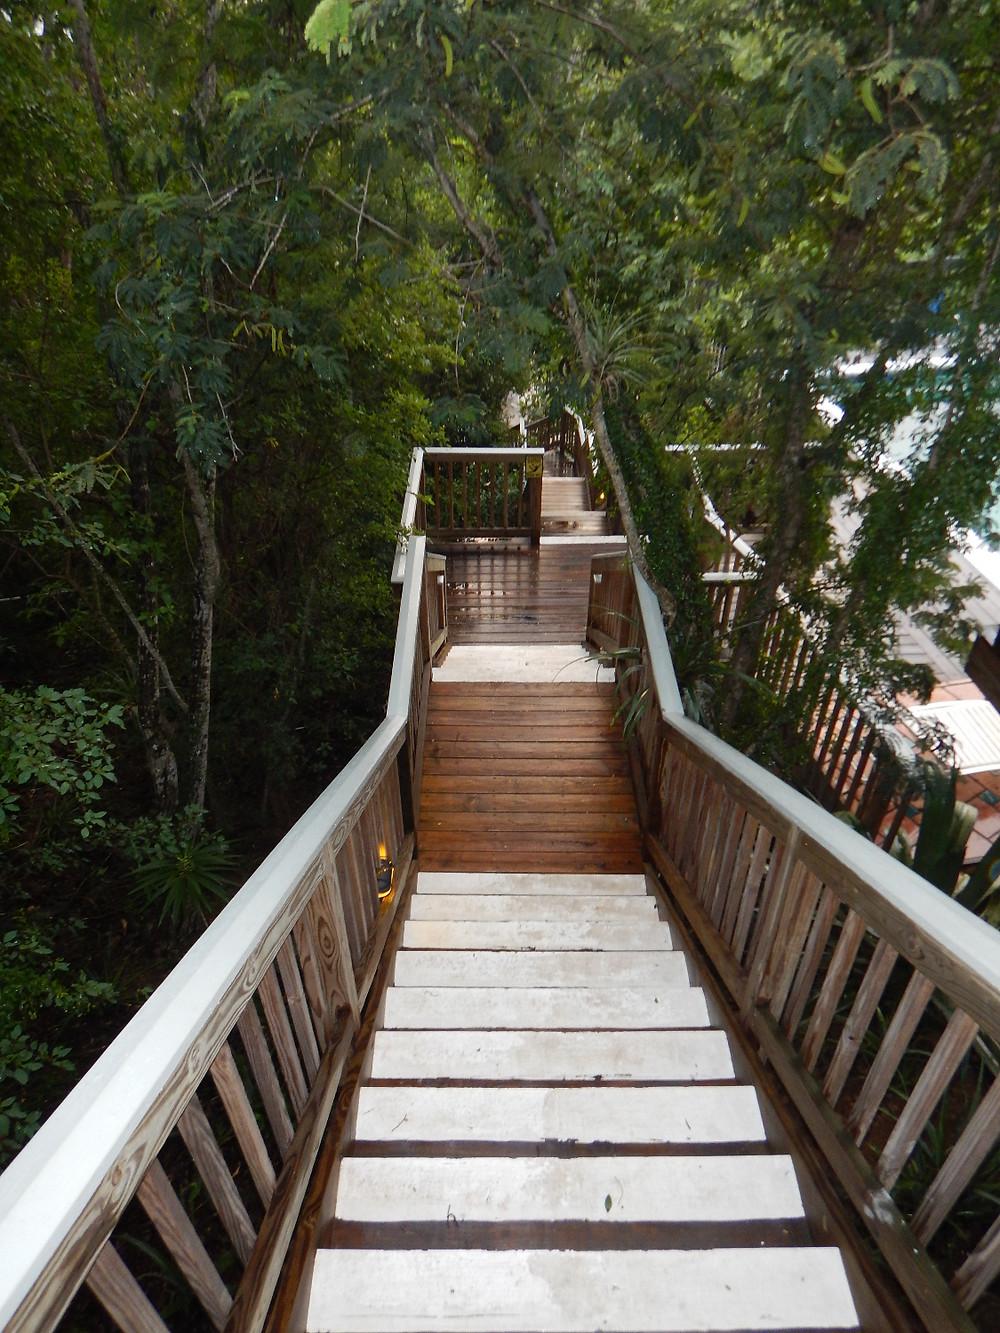 Stairs, Concordia, deck, sunlight, St. John, Salt Pond Bay, travel, eco tent, eco resort